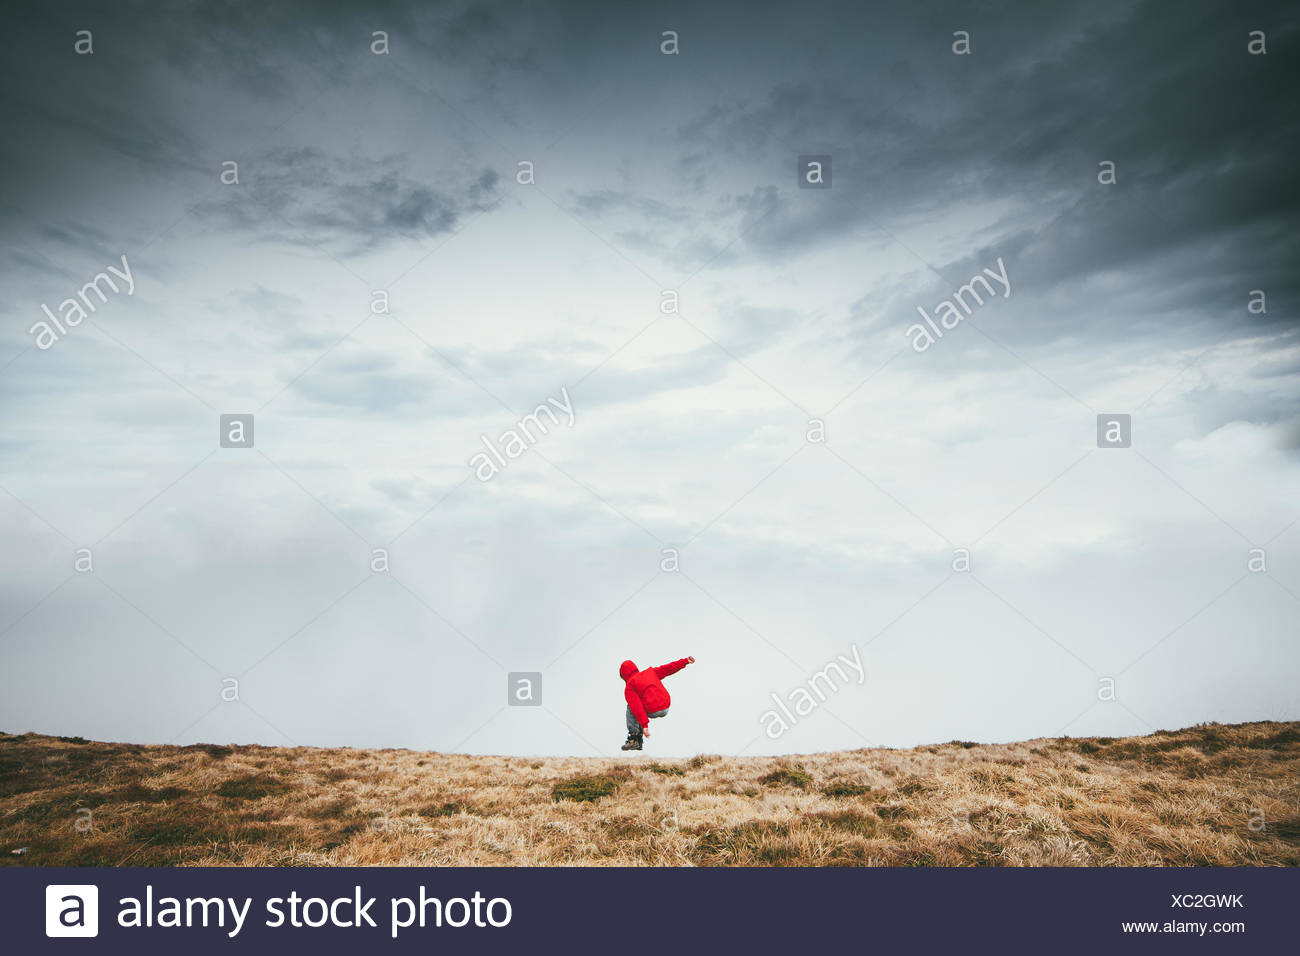 Man jumping - Stock Image